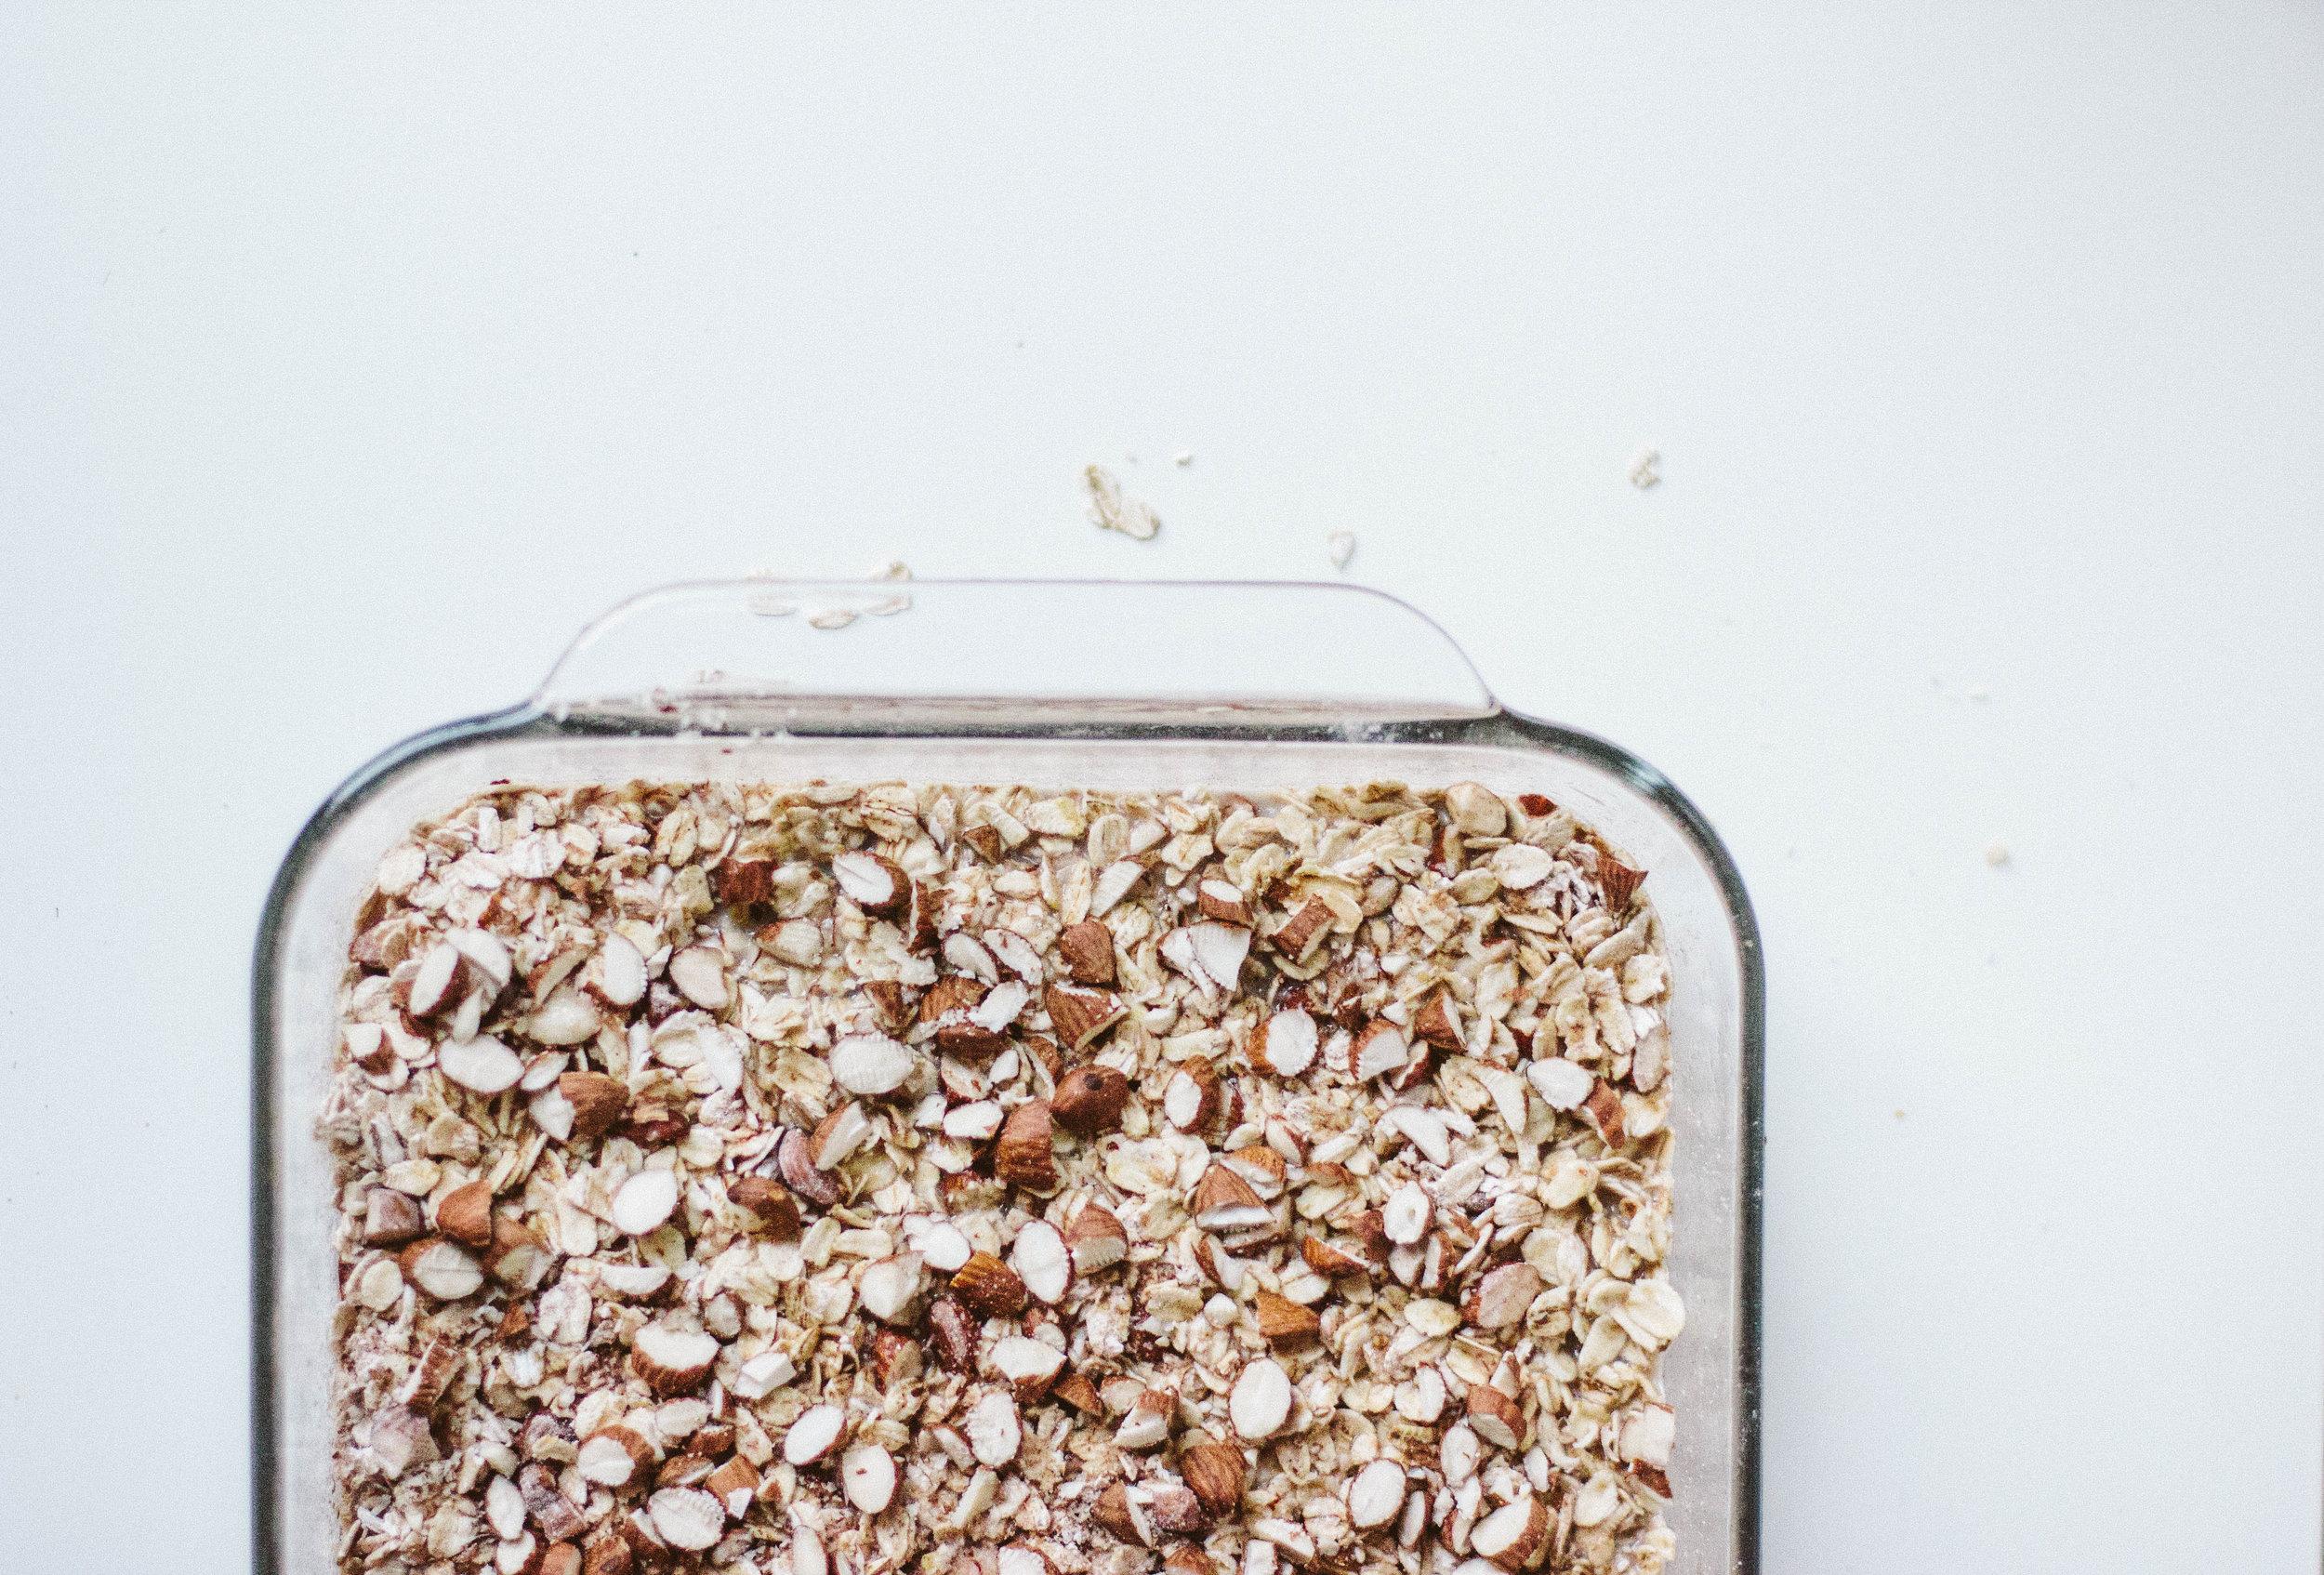 baked-oatmeal-7-1.jpg